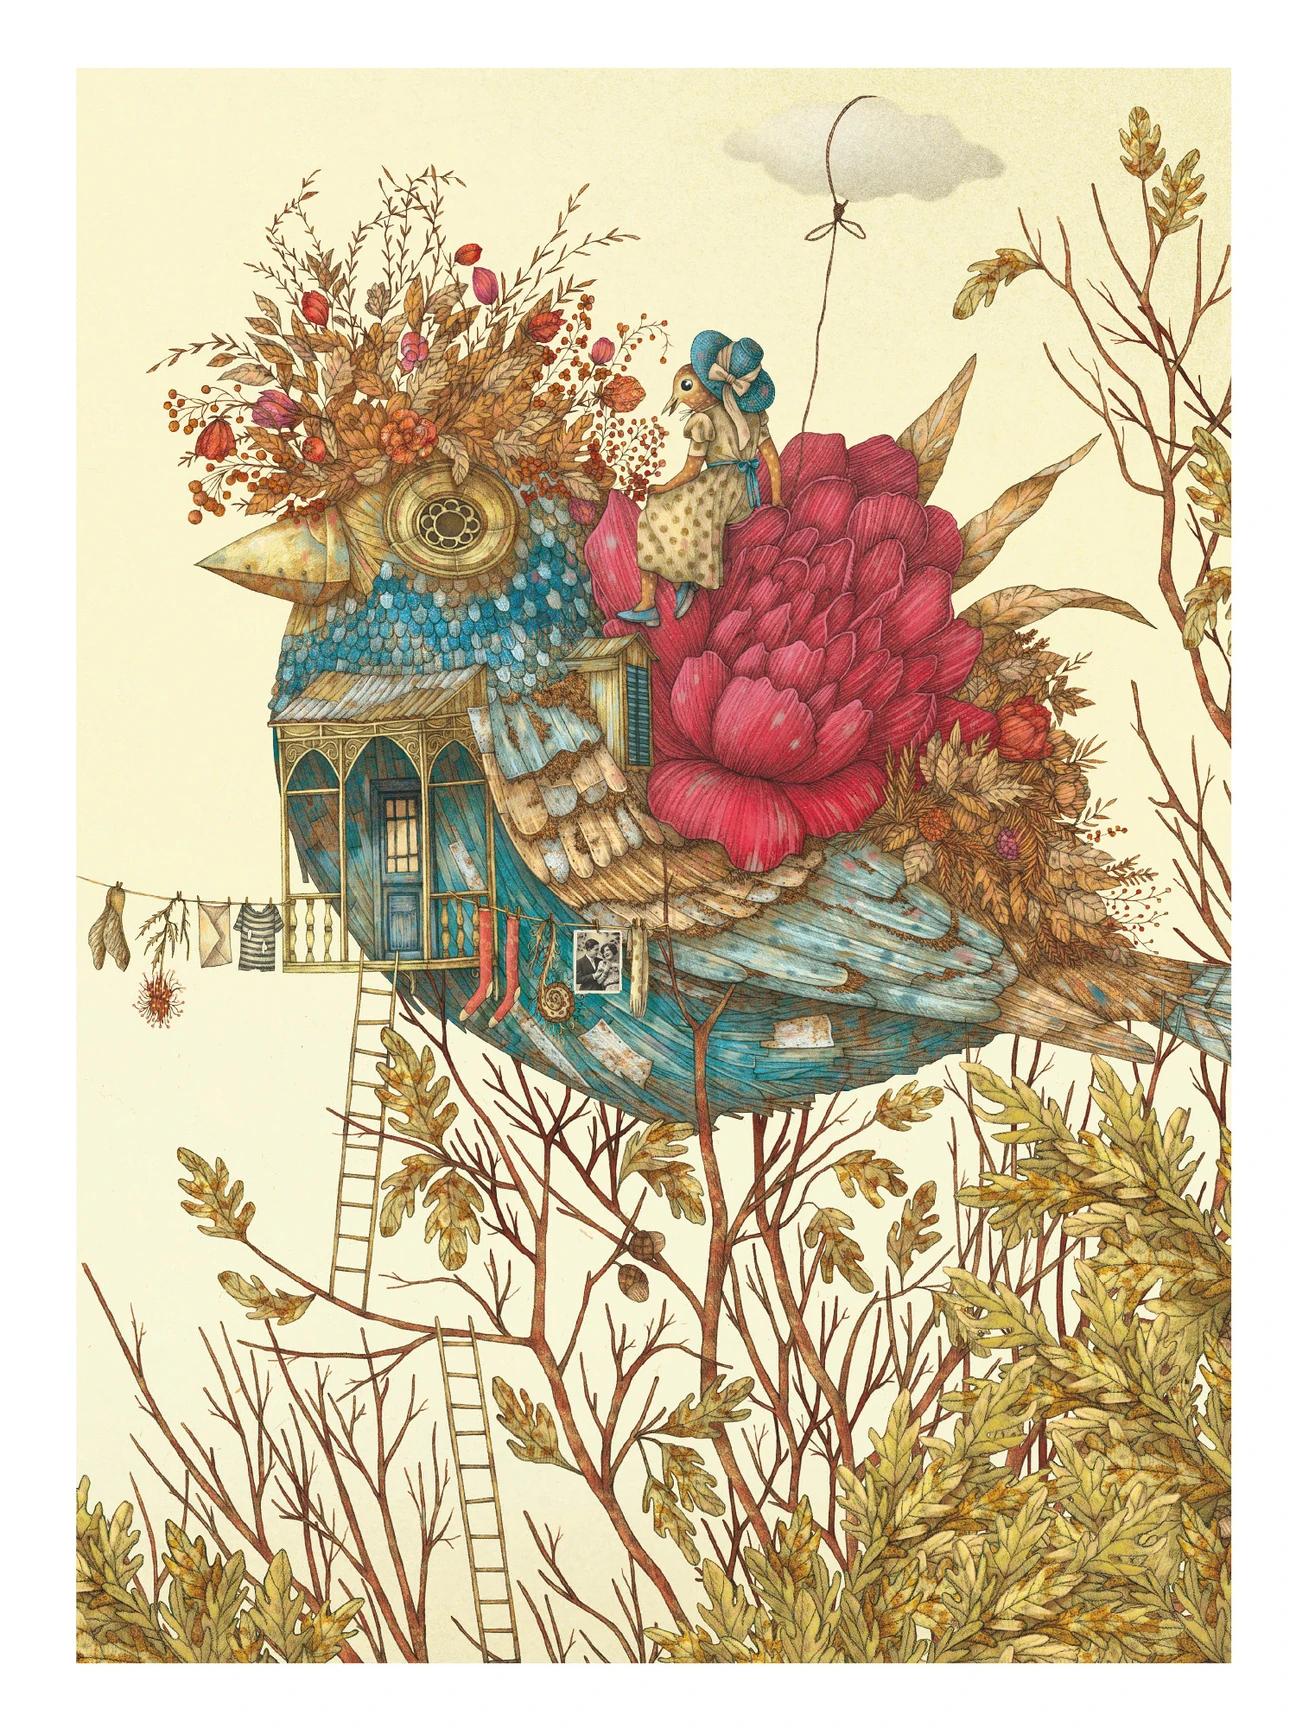 www.instagram.com/marcoillustratore